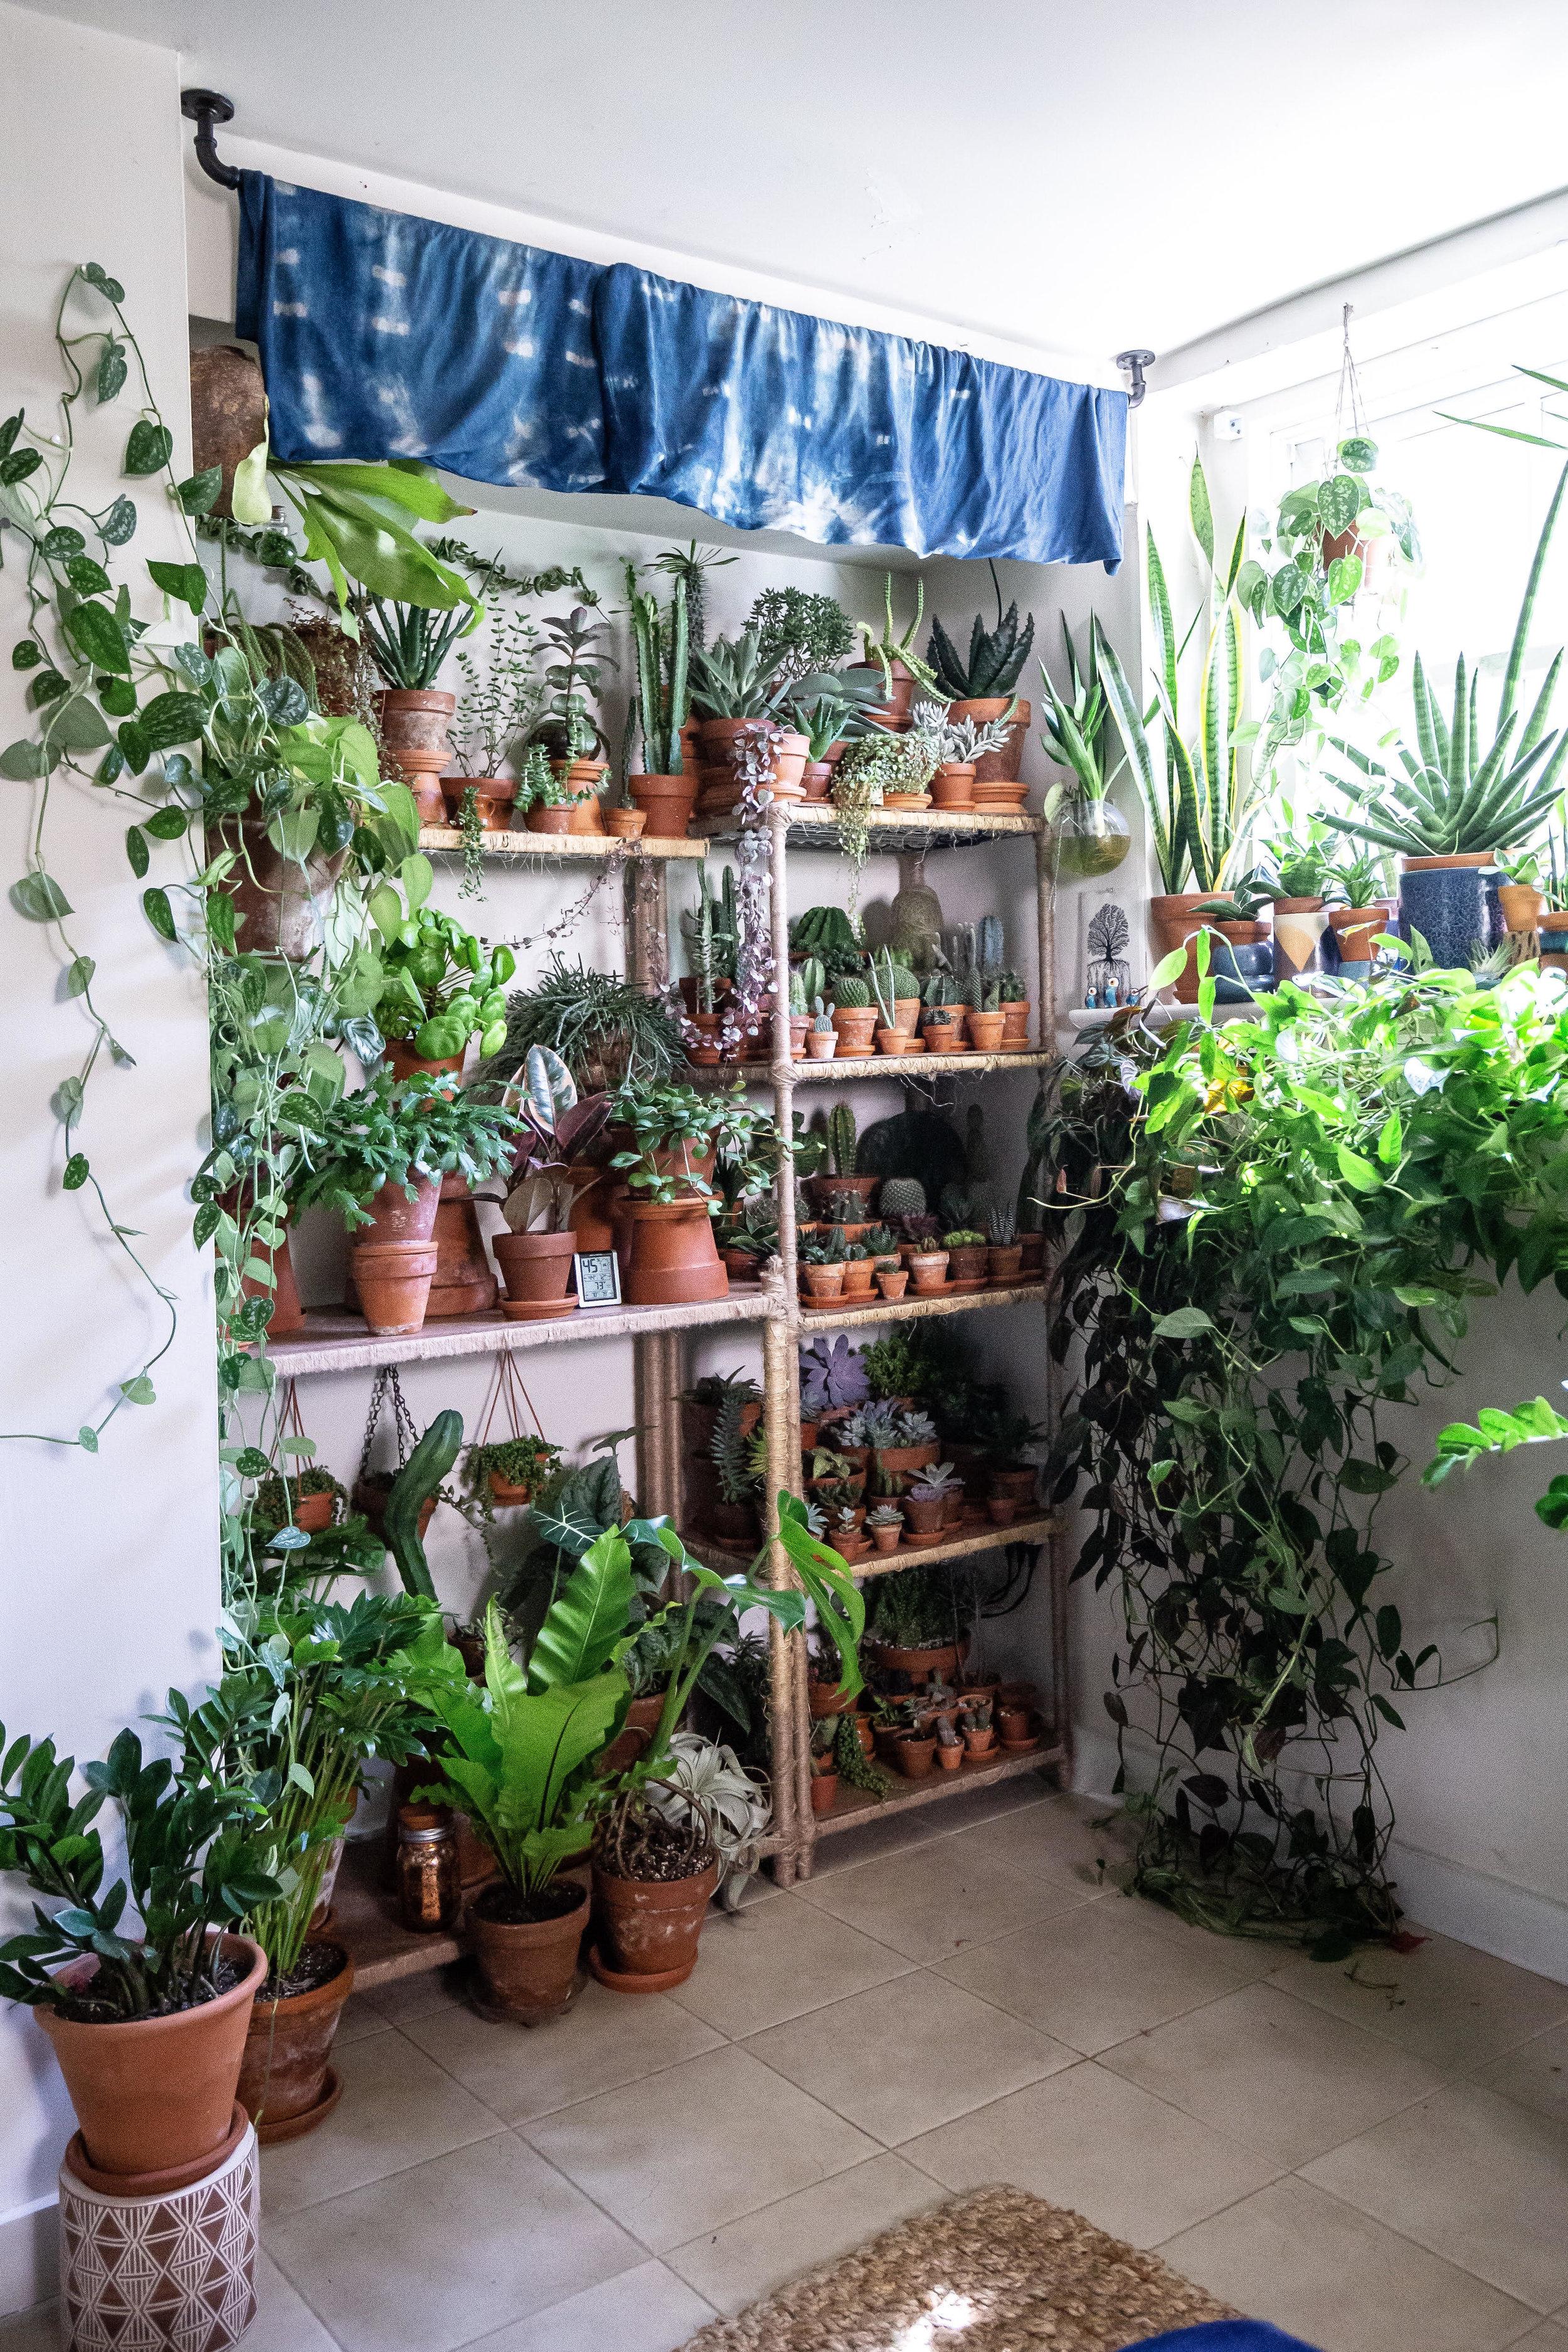 Kevin's plant shelf